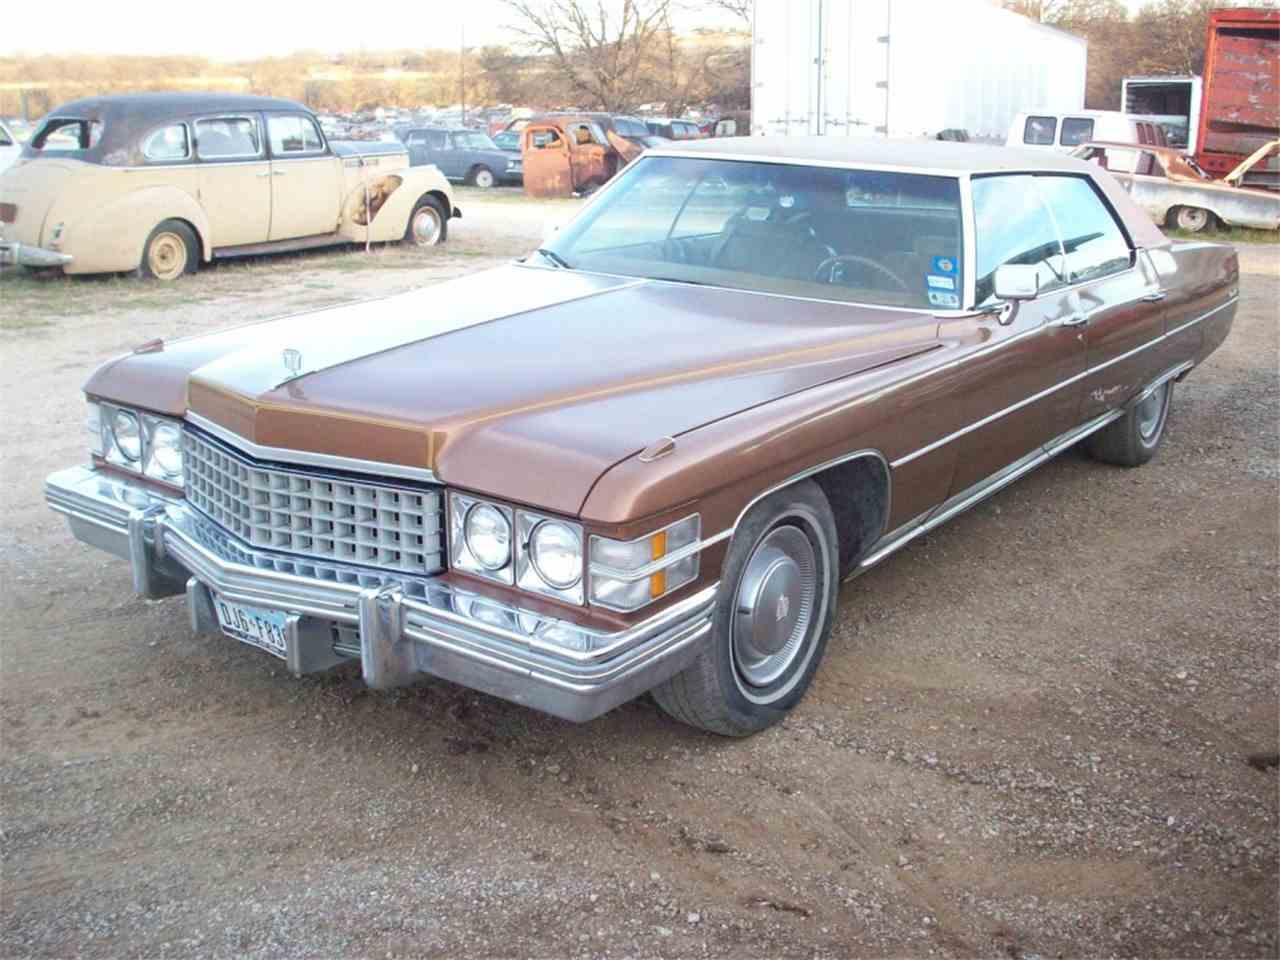 1974 Cadillac Sedan DeVille for Sale - CC-889101